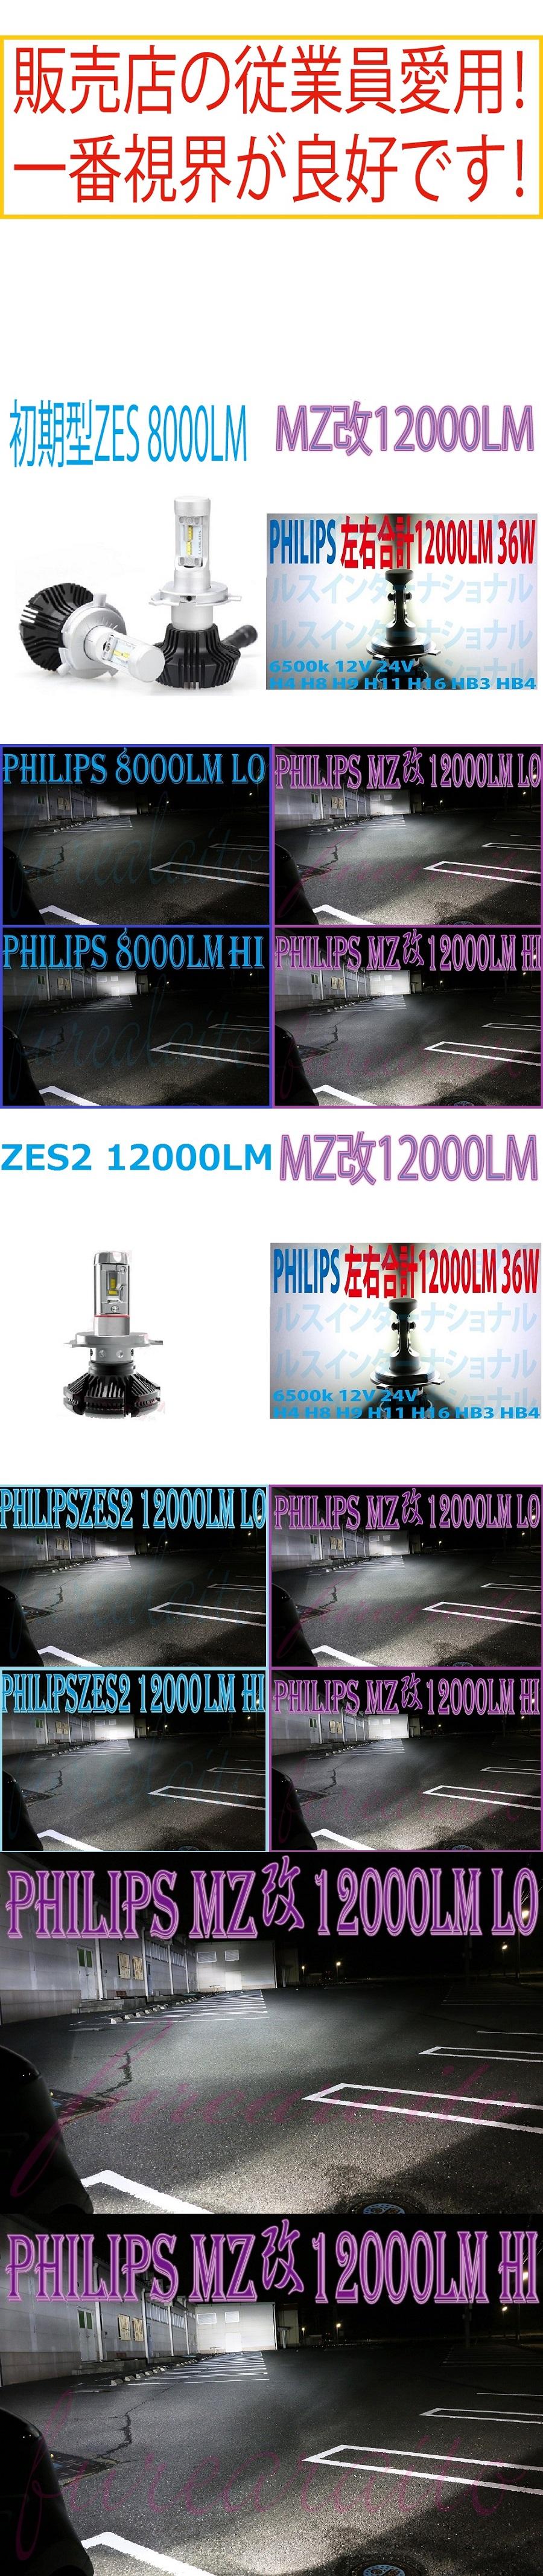 限定5個 Philips 8000LM H4 Hi/Lo H8 H9 H11 H16 6500k 5年保証